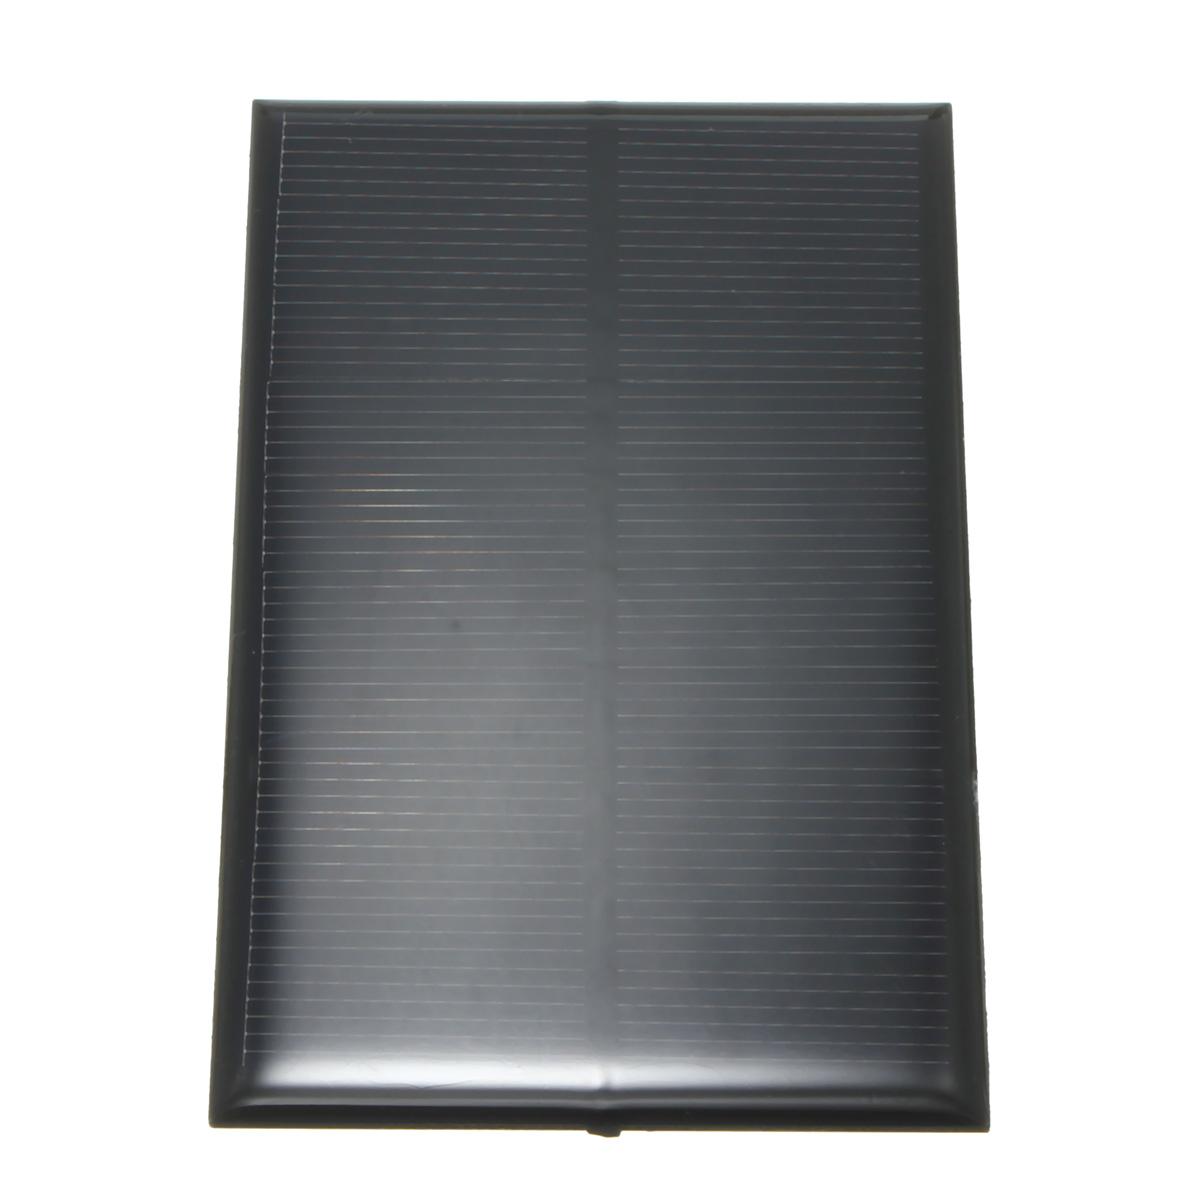 5V 1 25W 250mA Monocrystalline Silicon Epoxy Solar Panels Module kits Mini Solar Cells For Charging